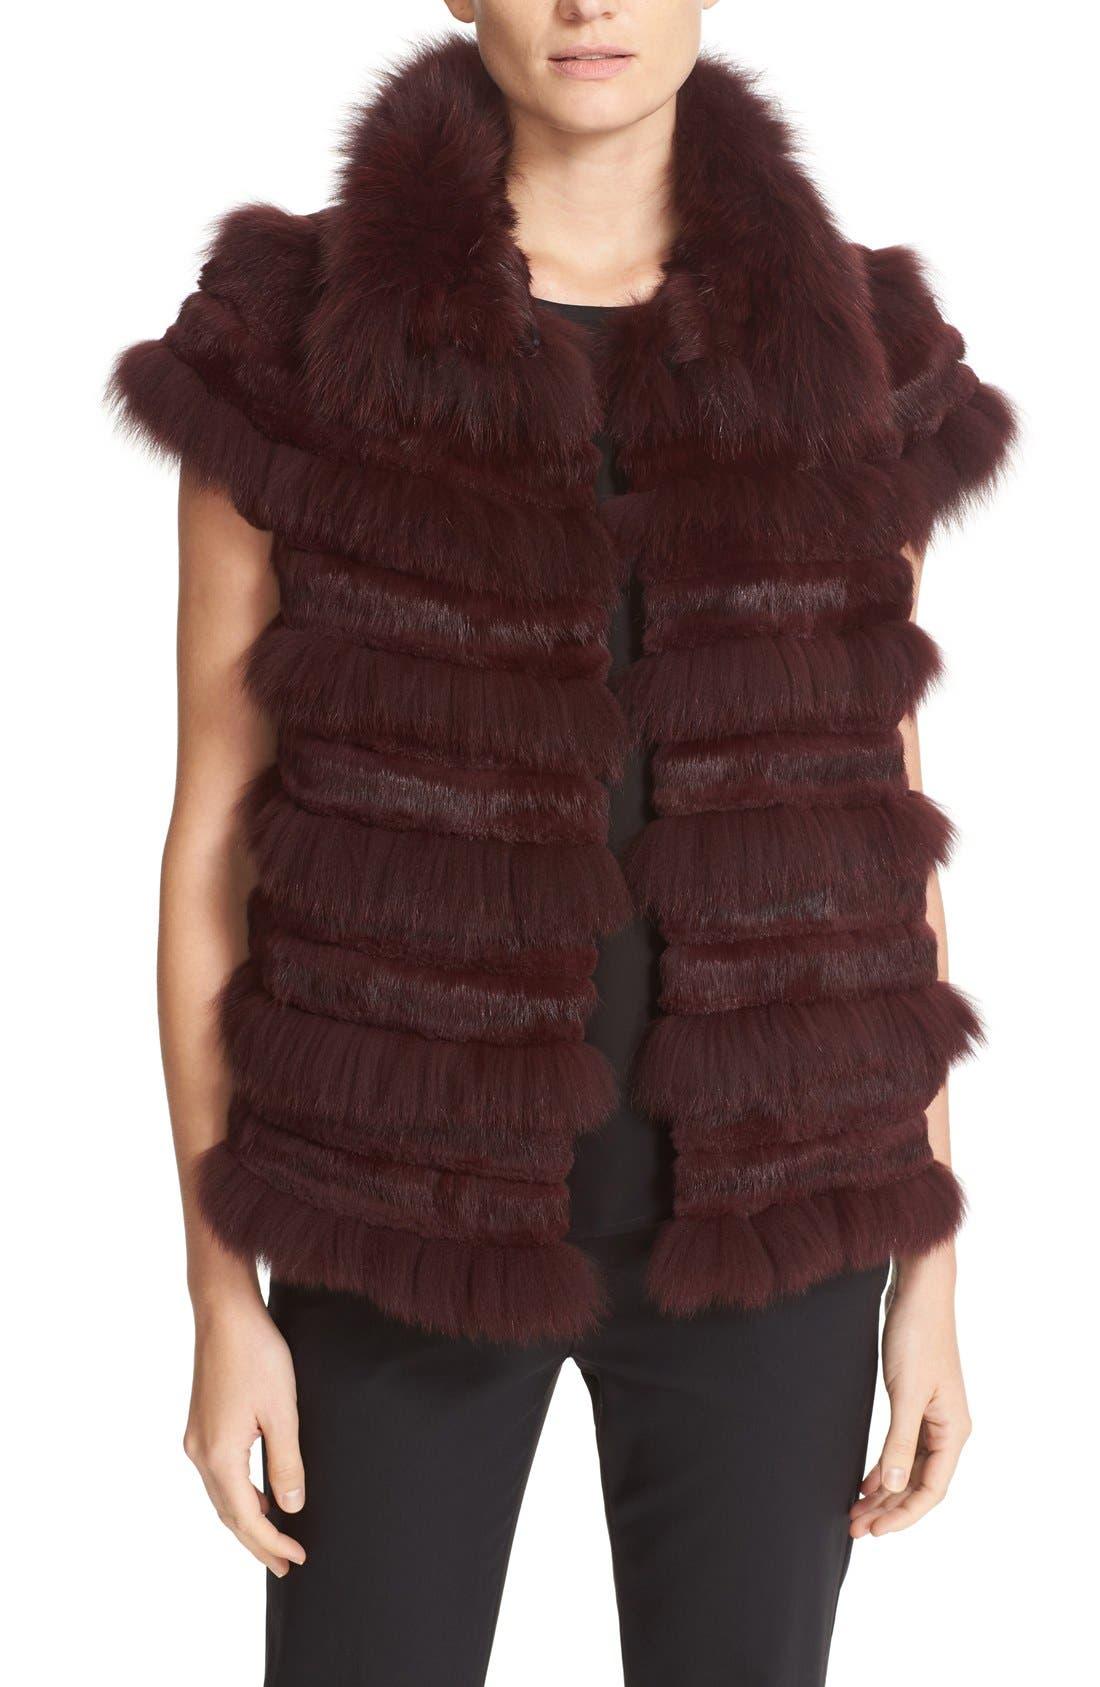 Tory Burch Blaire Genuine Rabbit & Fox Fur Vest